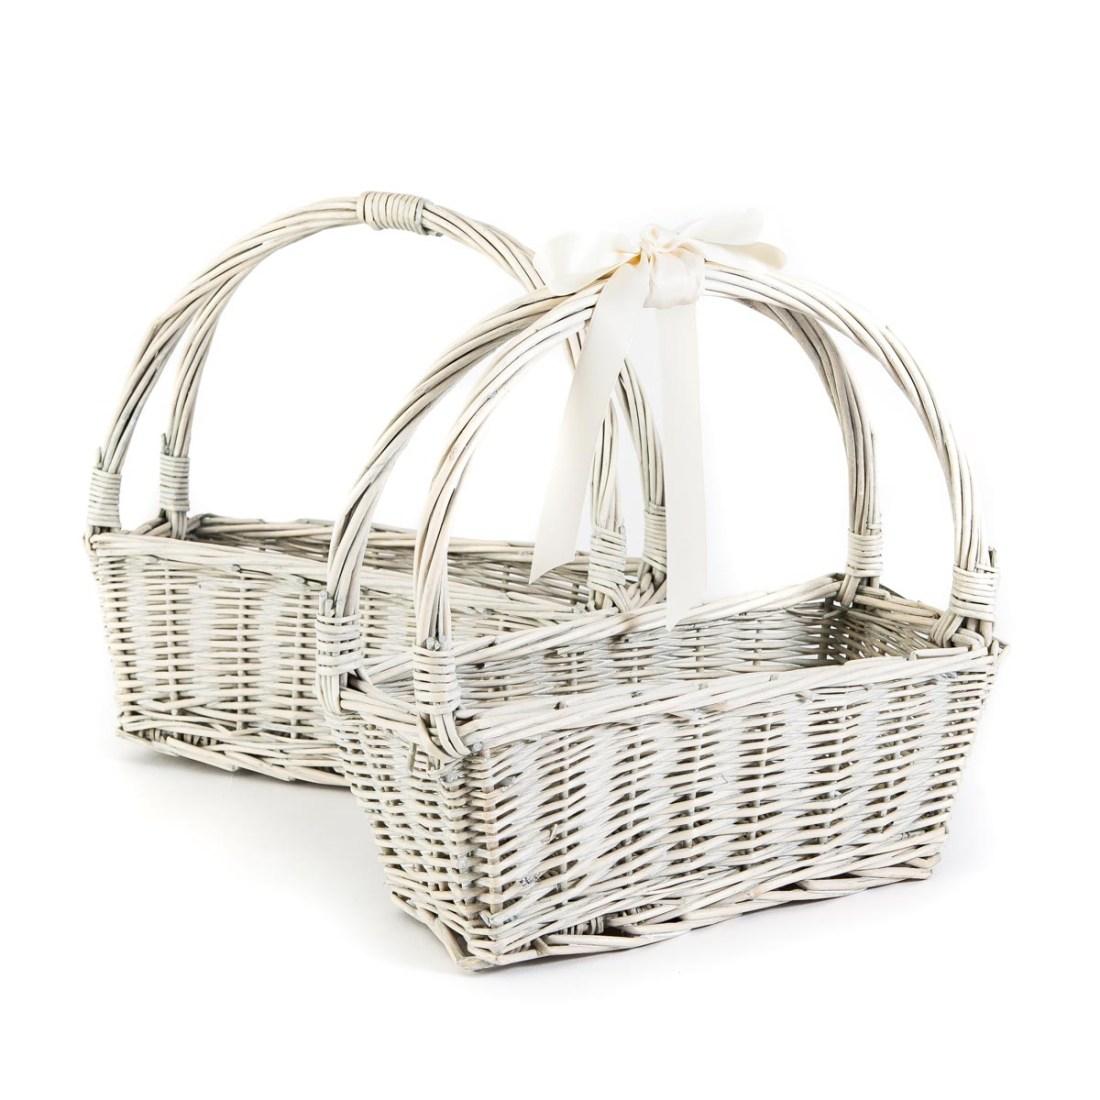 small white basket - confetti basket